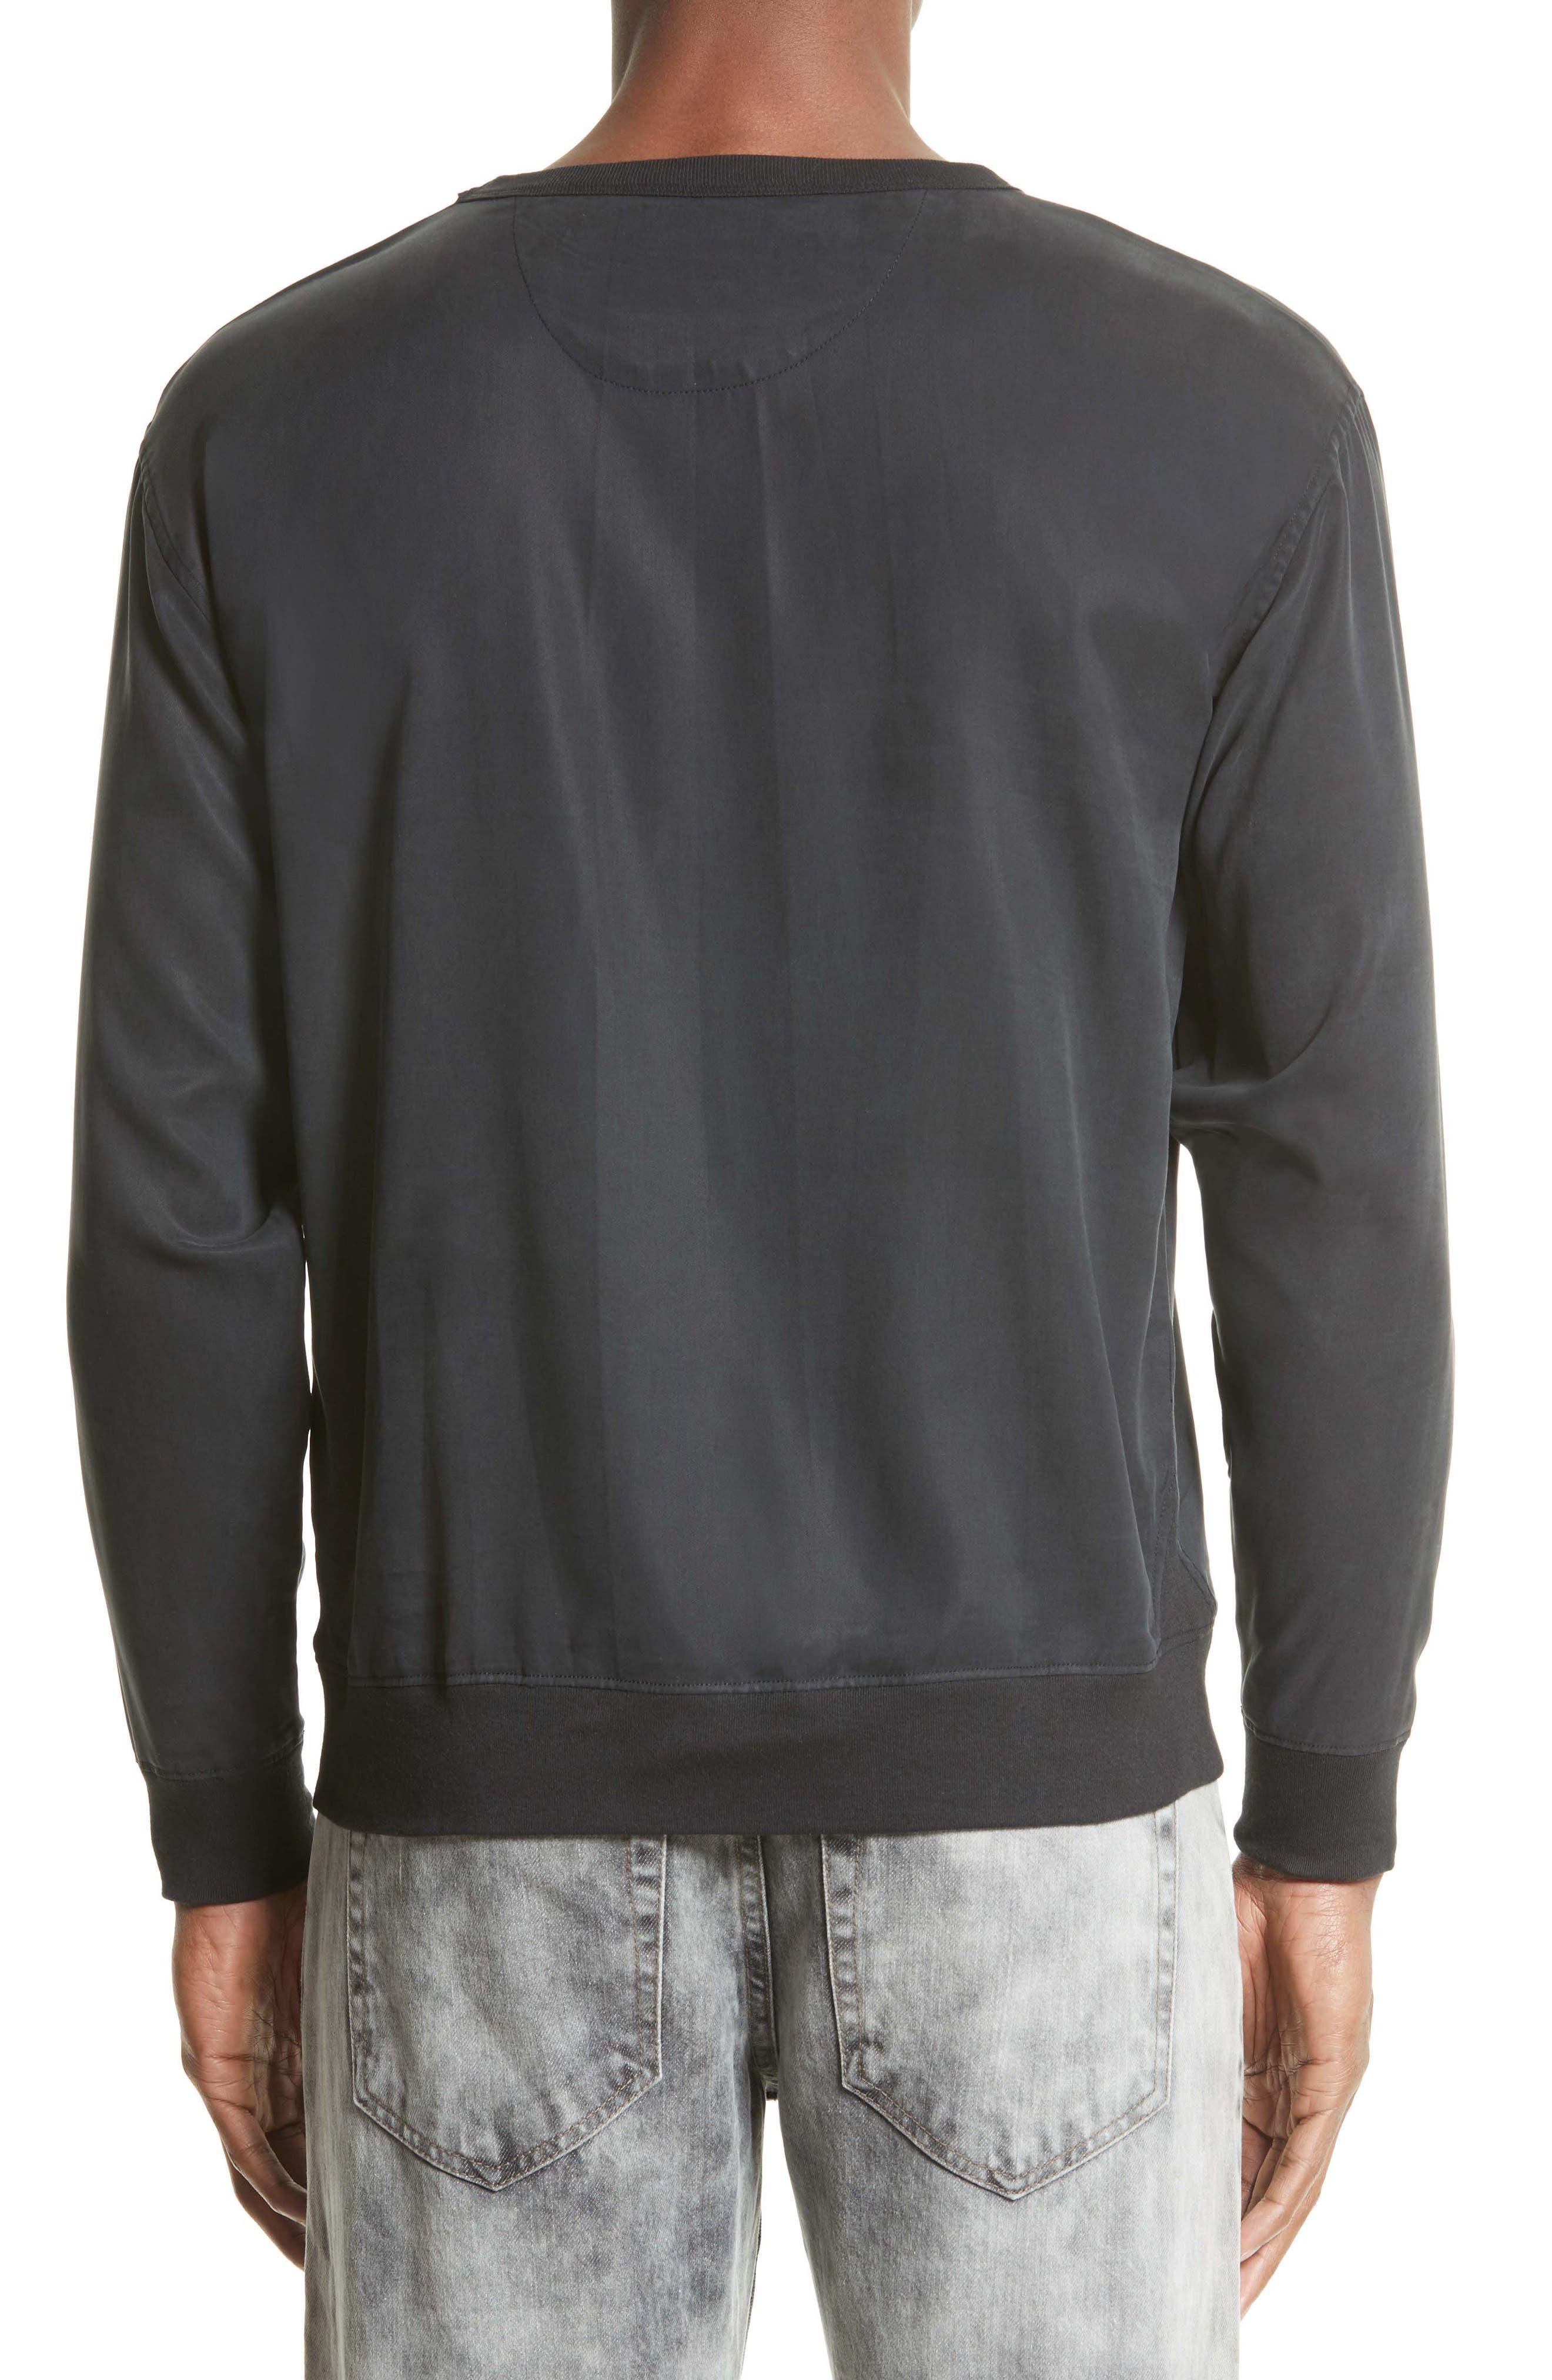 Duey Twill Crewneck Sweatshirt,                             Alternate thumbnail 2, color,                             001